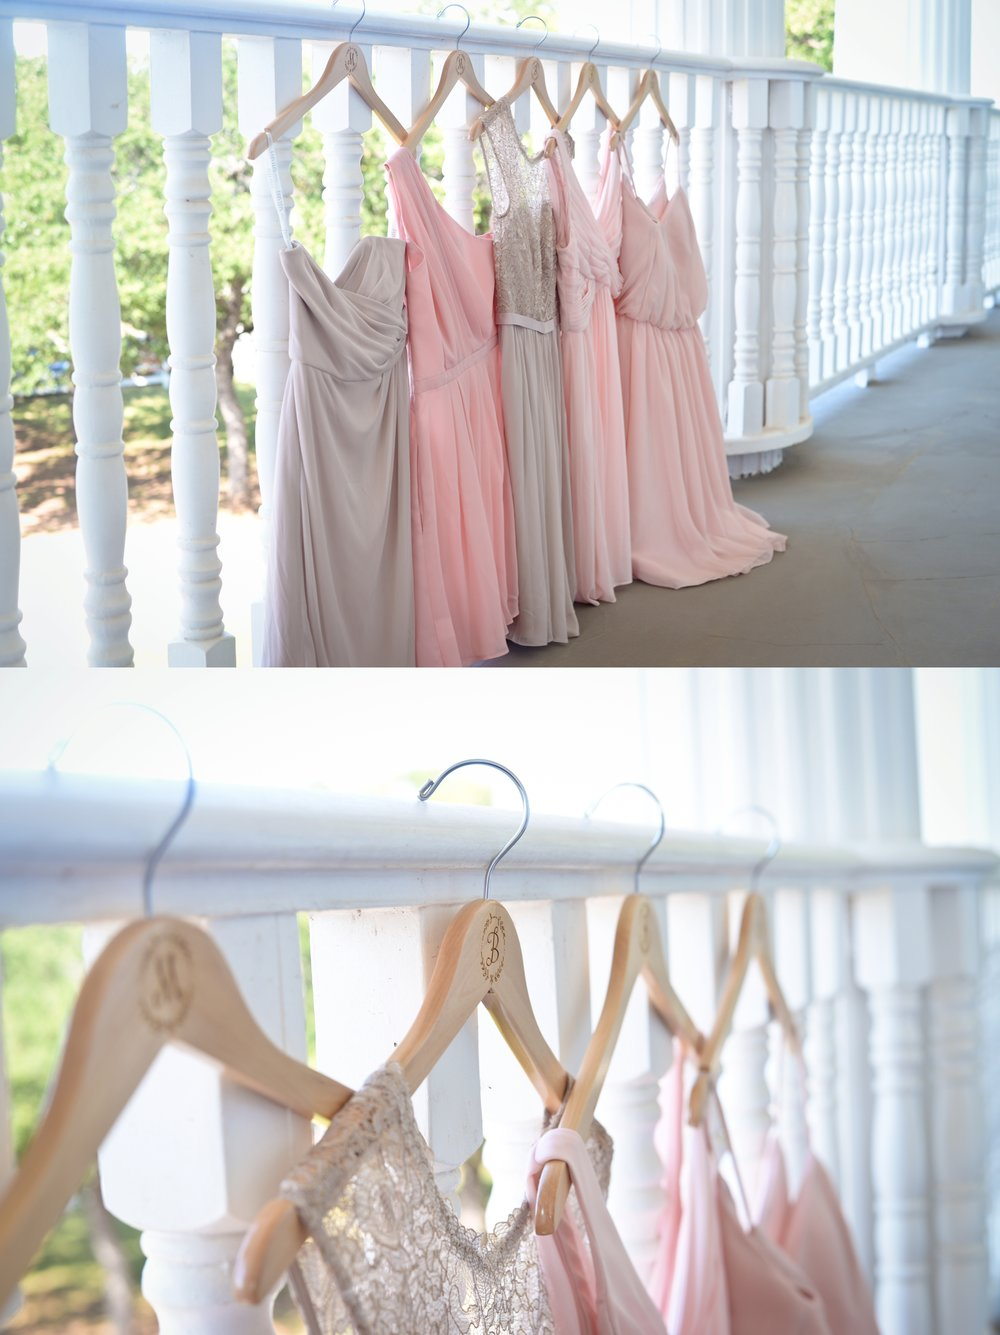 Lonestar-Mansion-Fort-Worth-Wedding-Planner-Burleson-Wedding-Venue_07.jpg